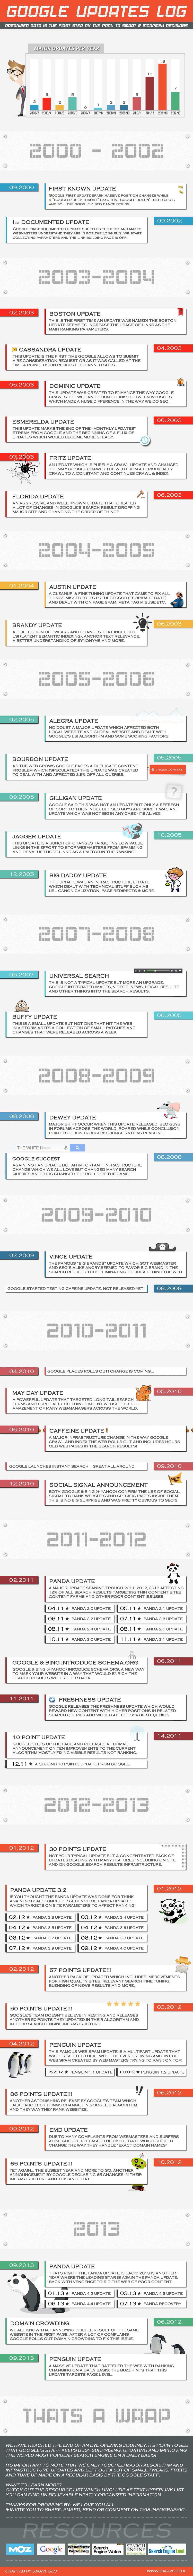 google-updates-log_524819cb31925